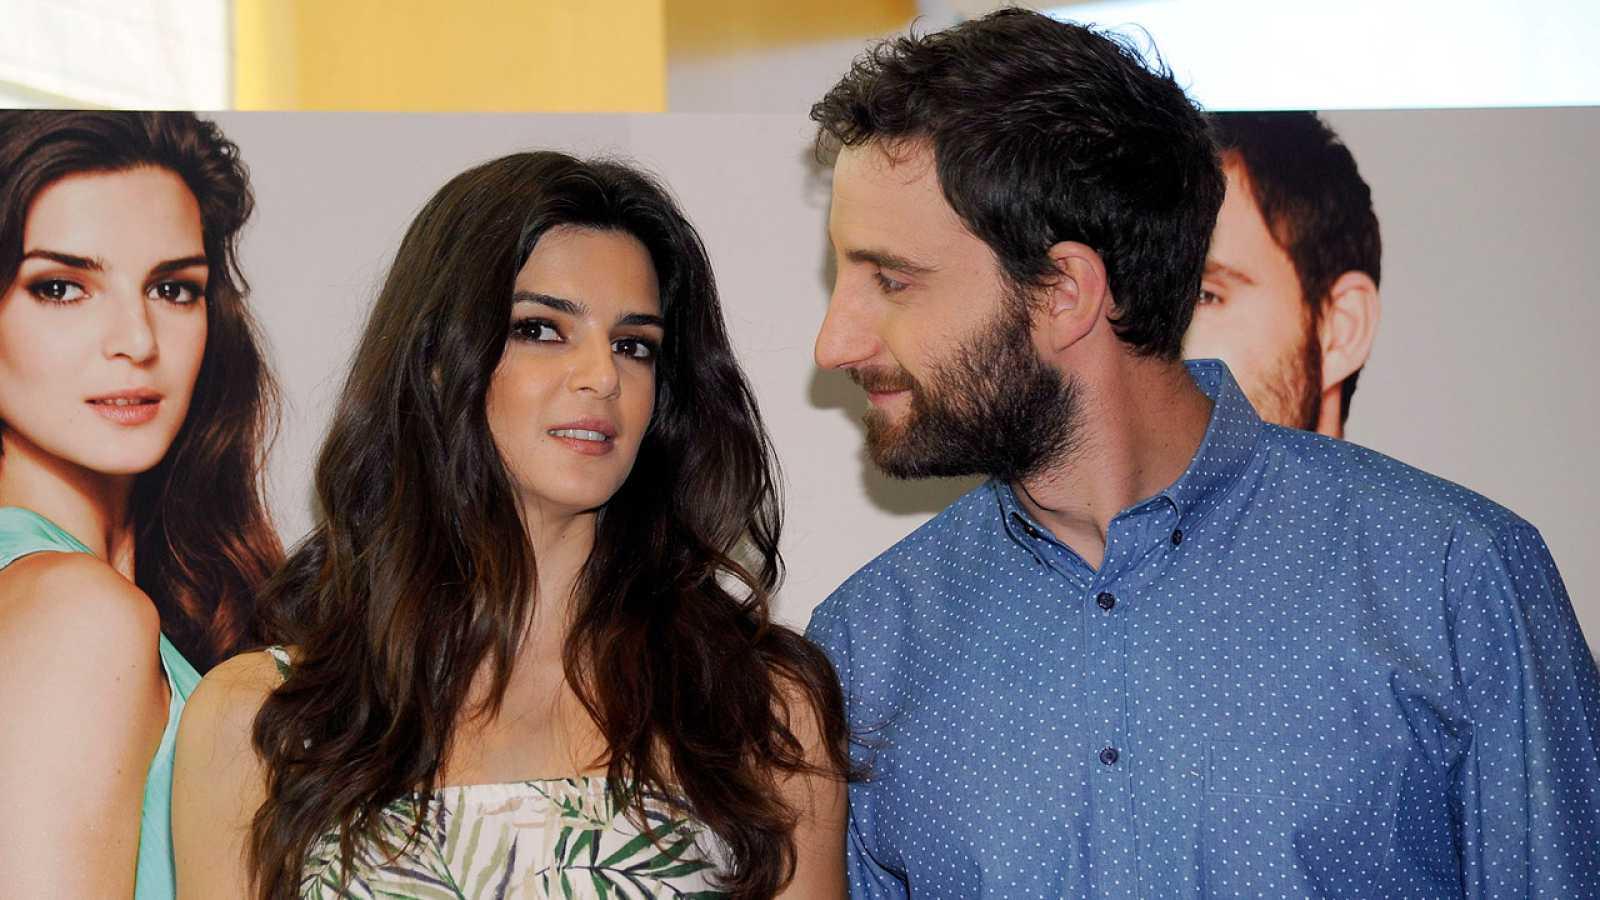 La actriz Clara Lago junto a su compañero, Dani Rovira